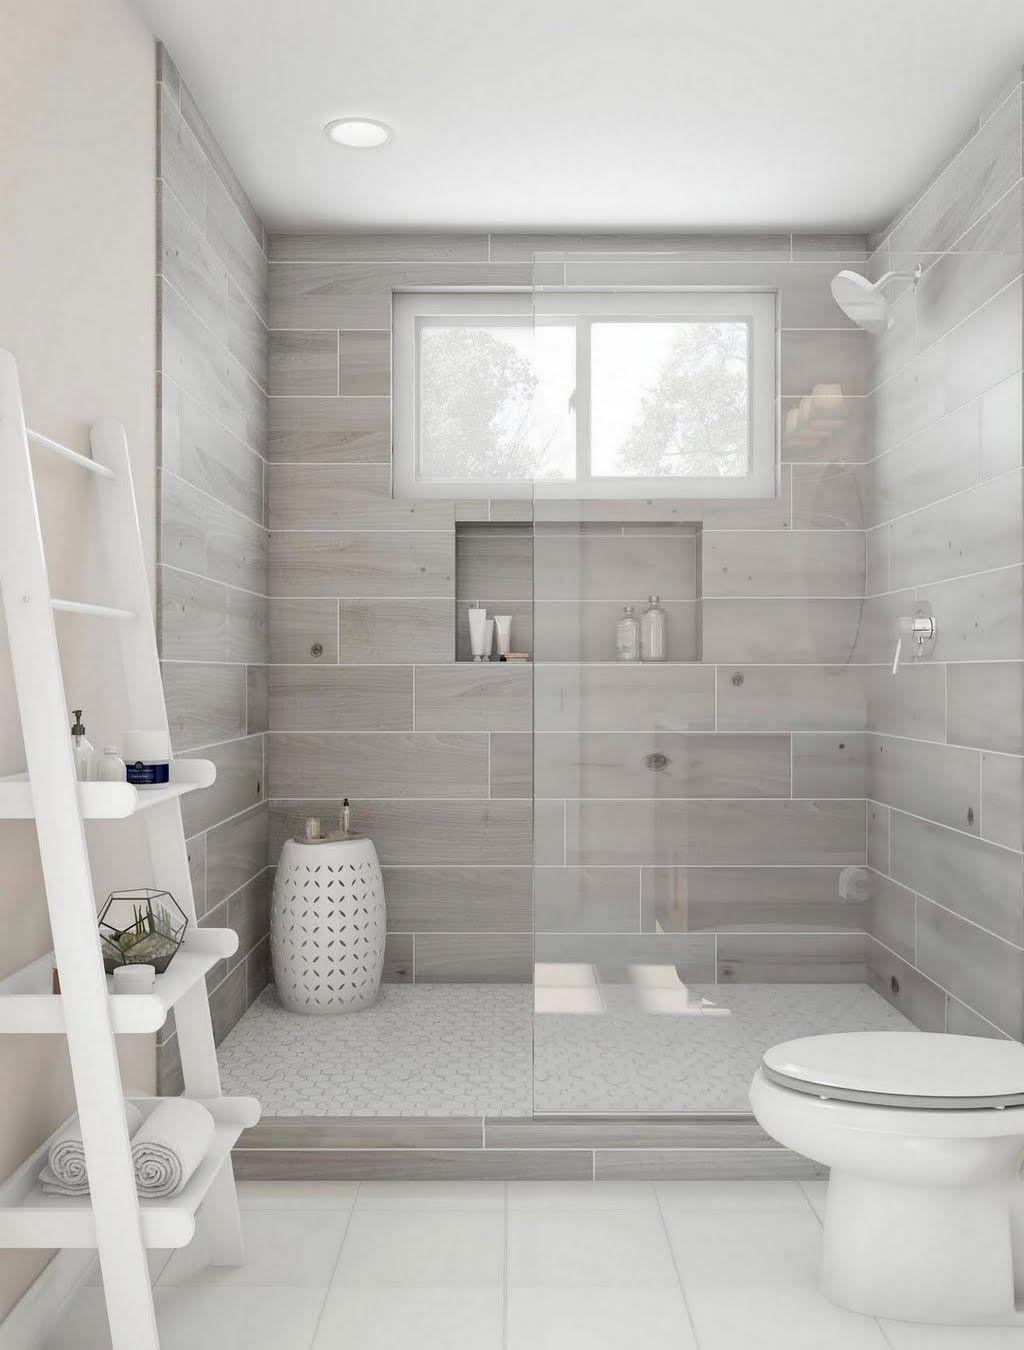 Lovely Bathroom Ceramic Tile Ideas You Should Copy 18